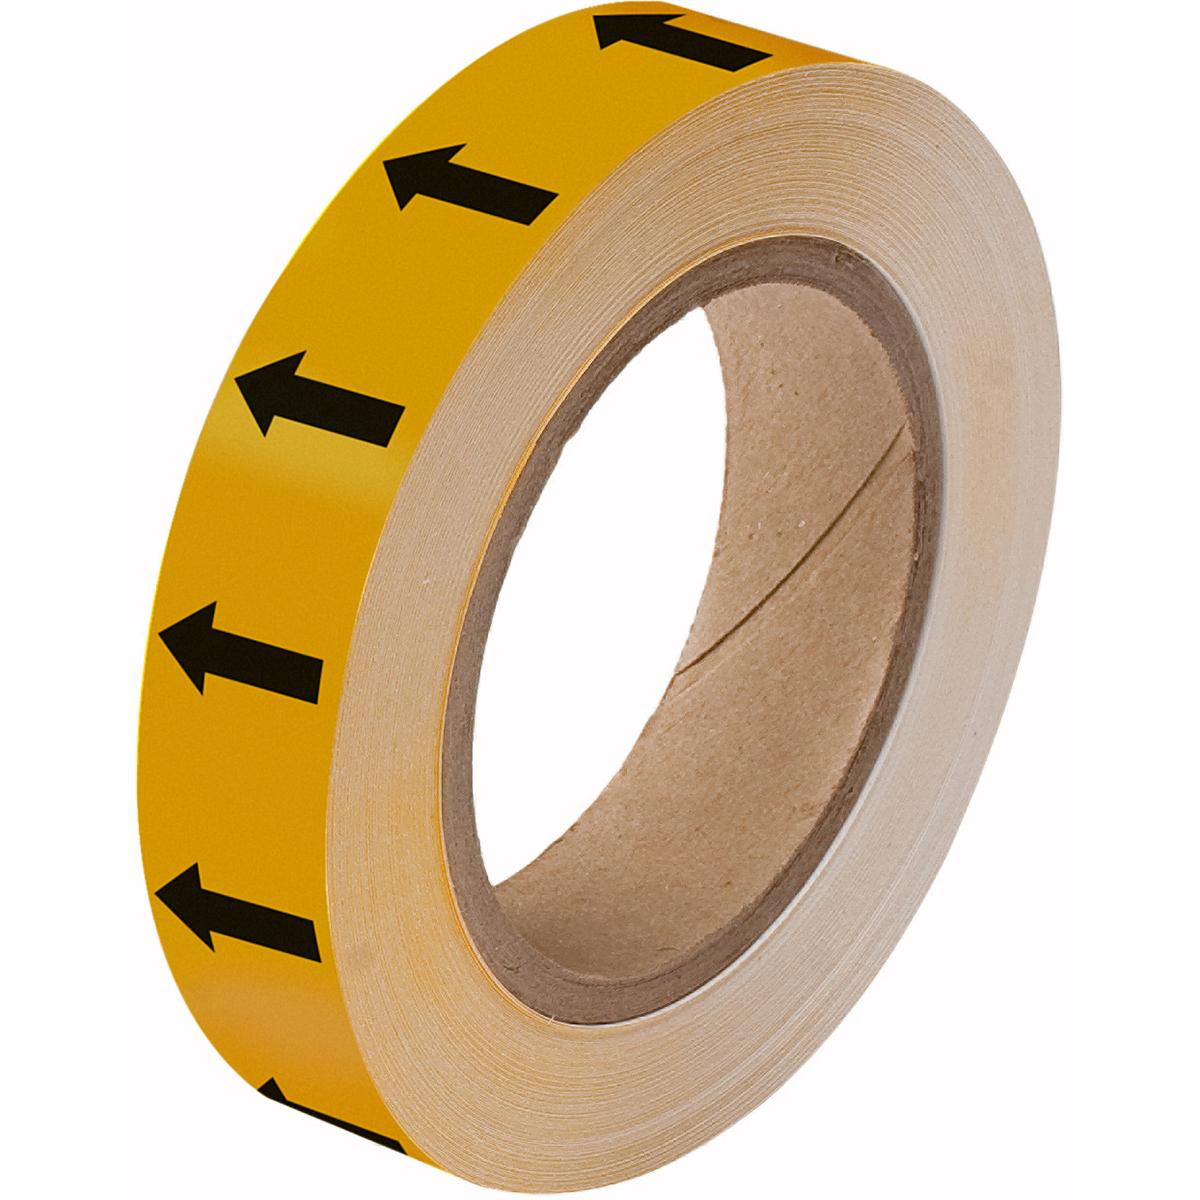 Black on Yellow Directional Flow Arrow Tape